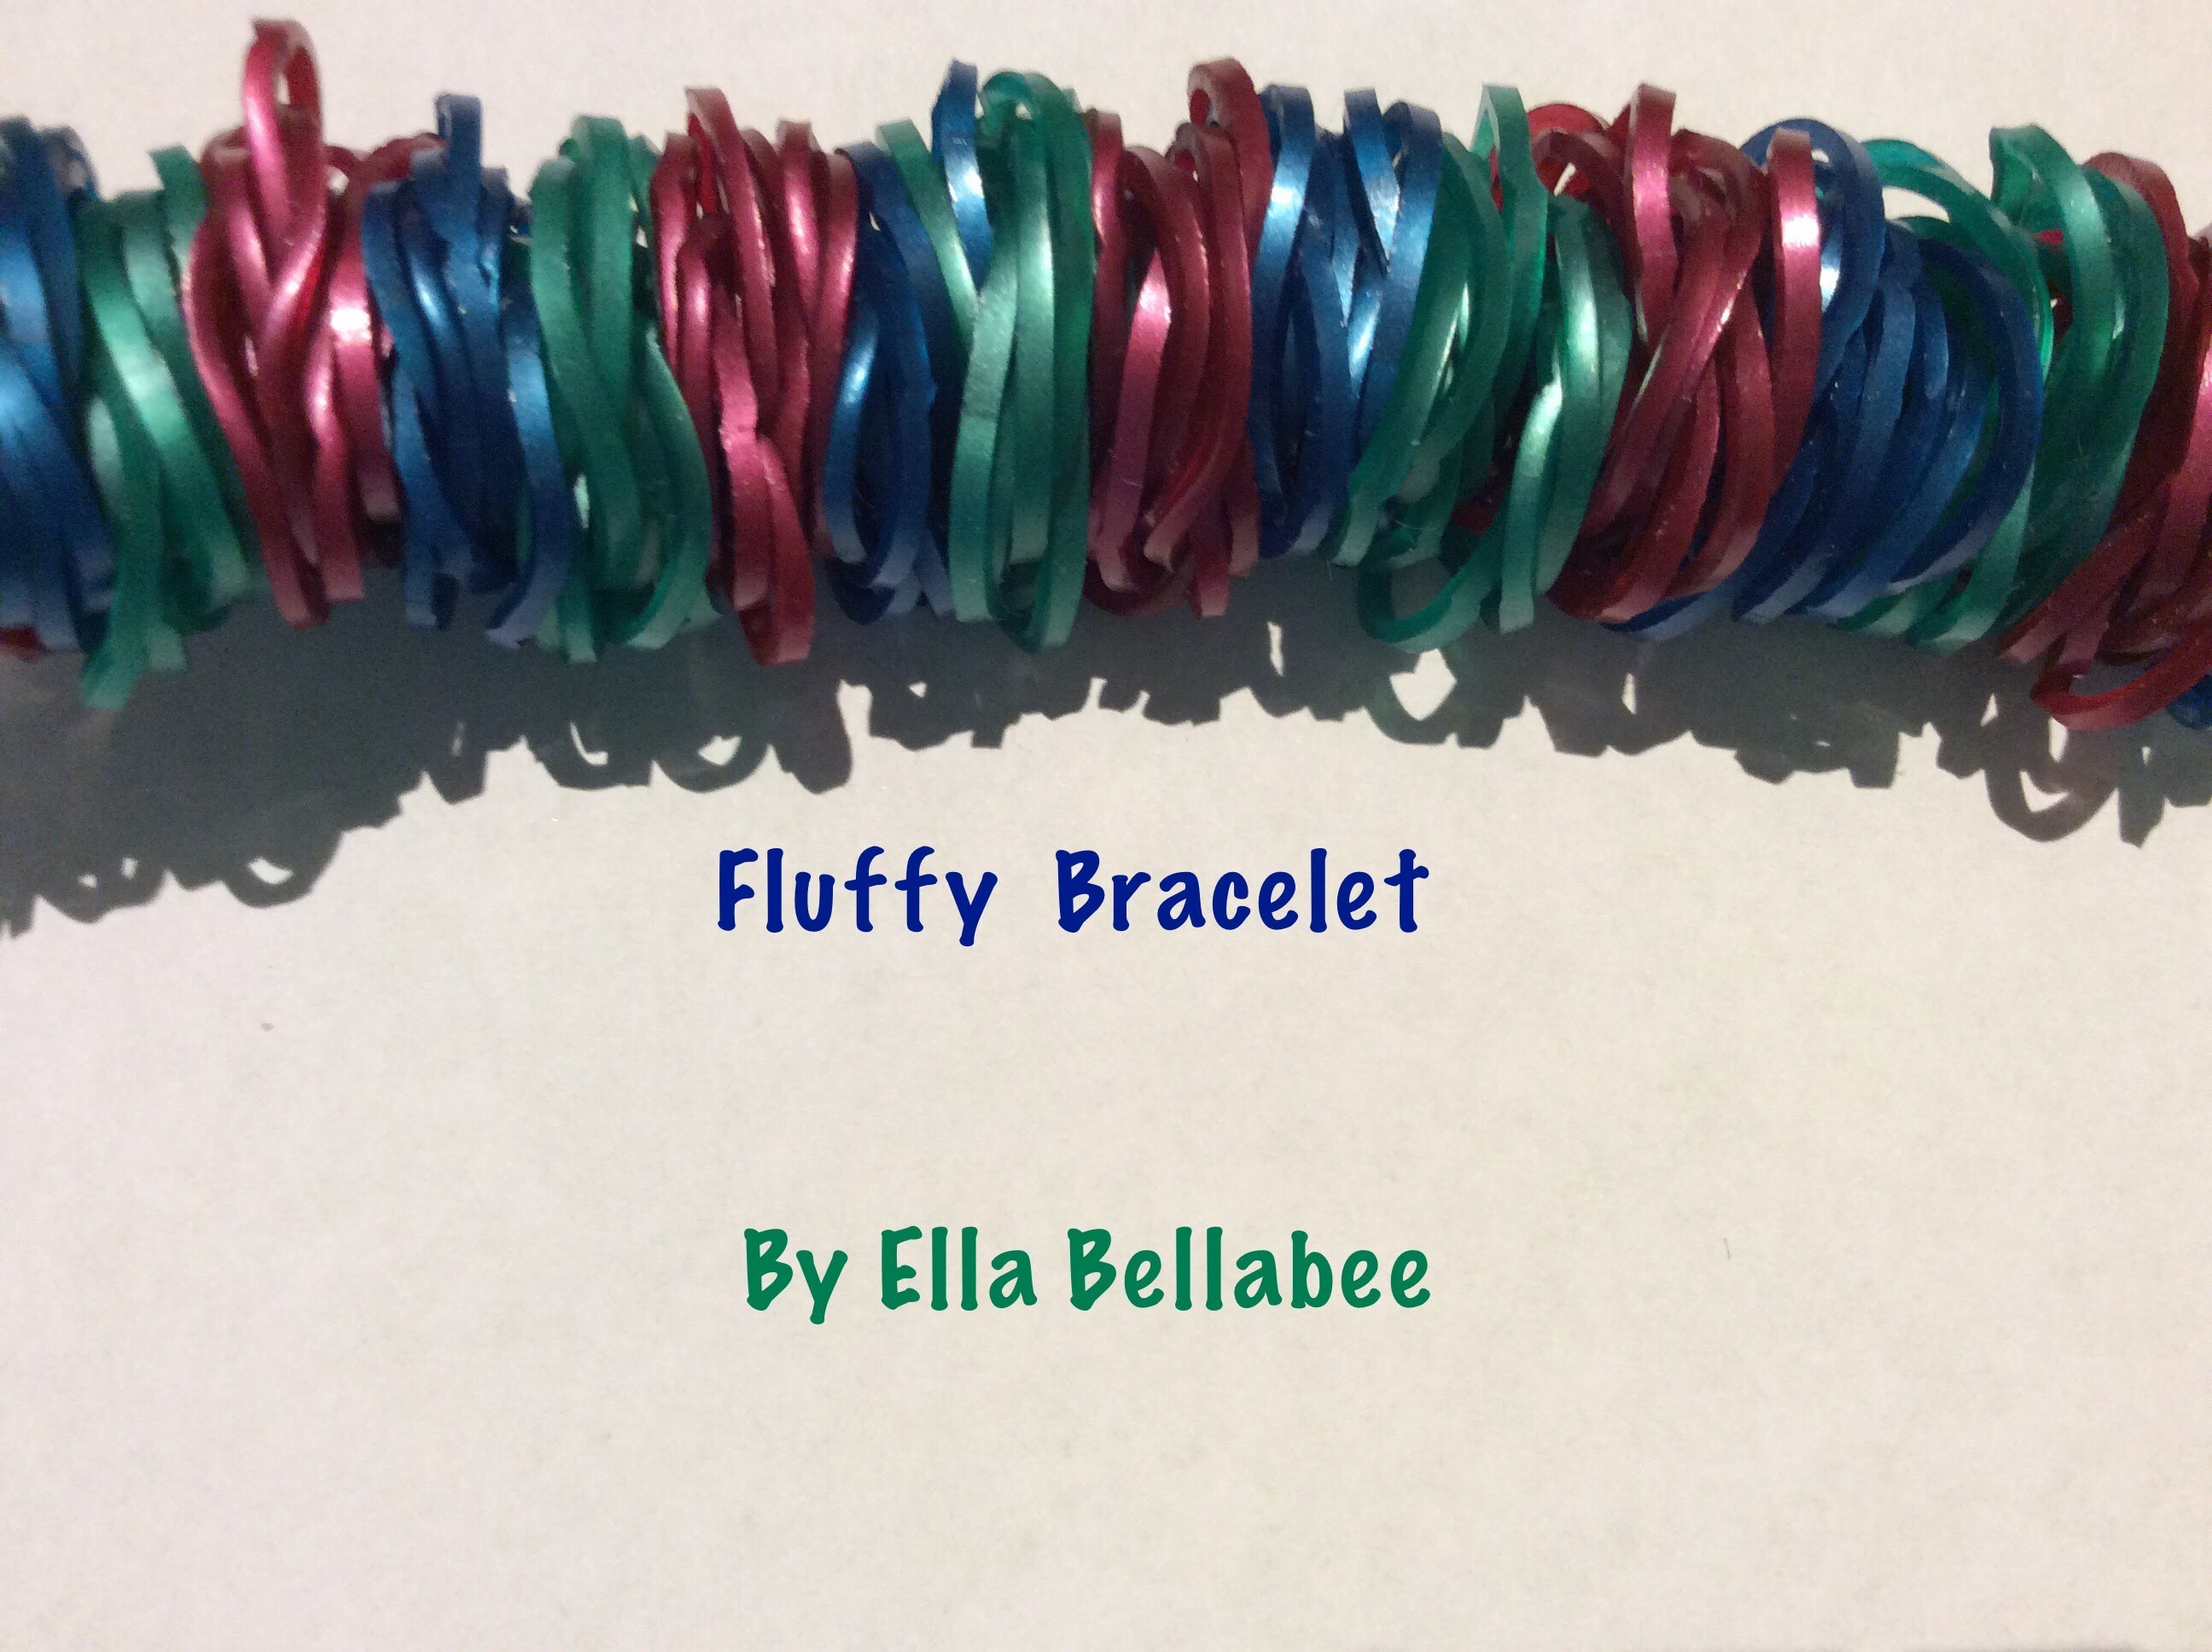 Rainbow Loom Nederlands | Fluffy Bracelet. Fluffy Armband